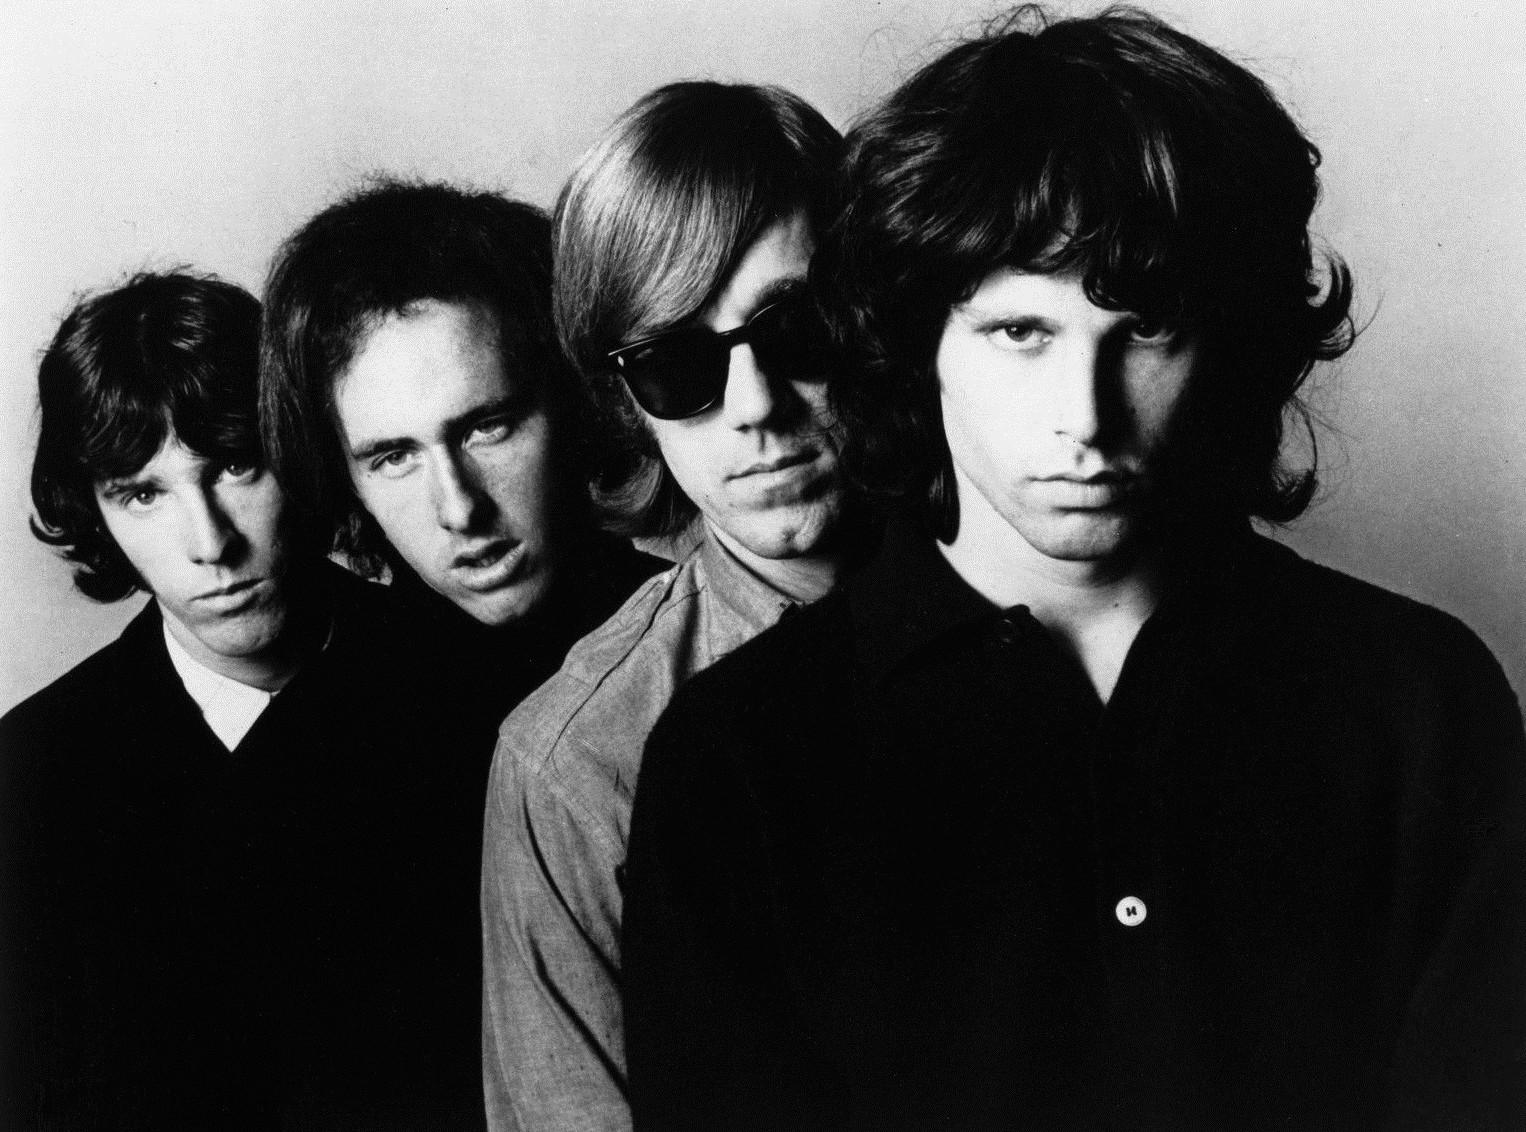 Bad Boy Jim Morrison & The Doors